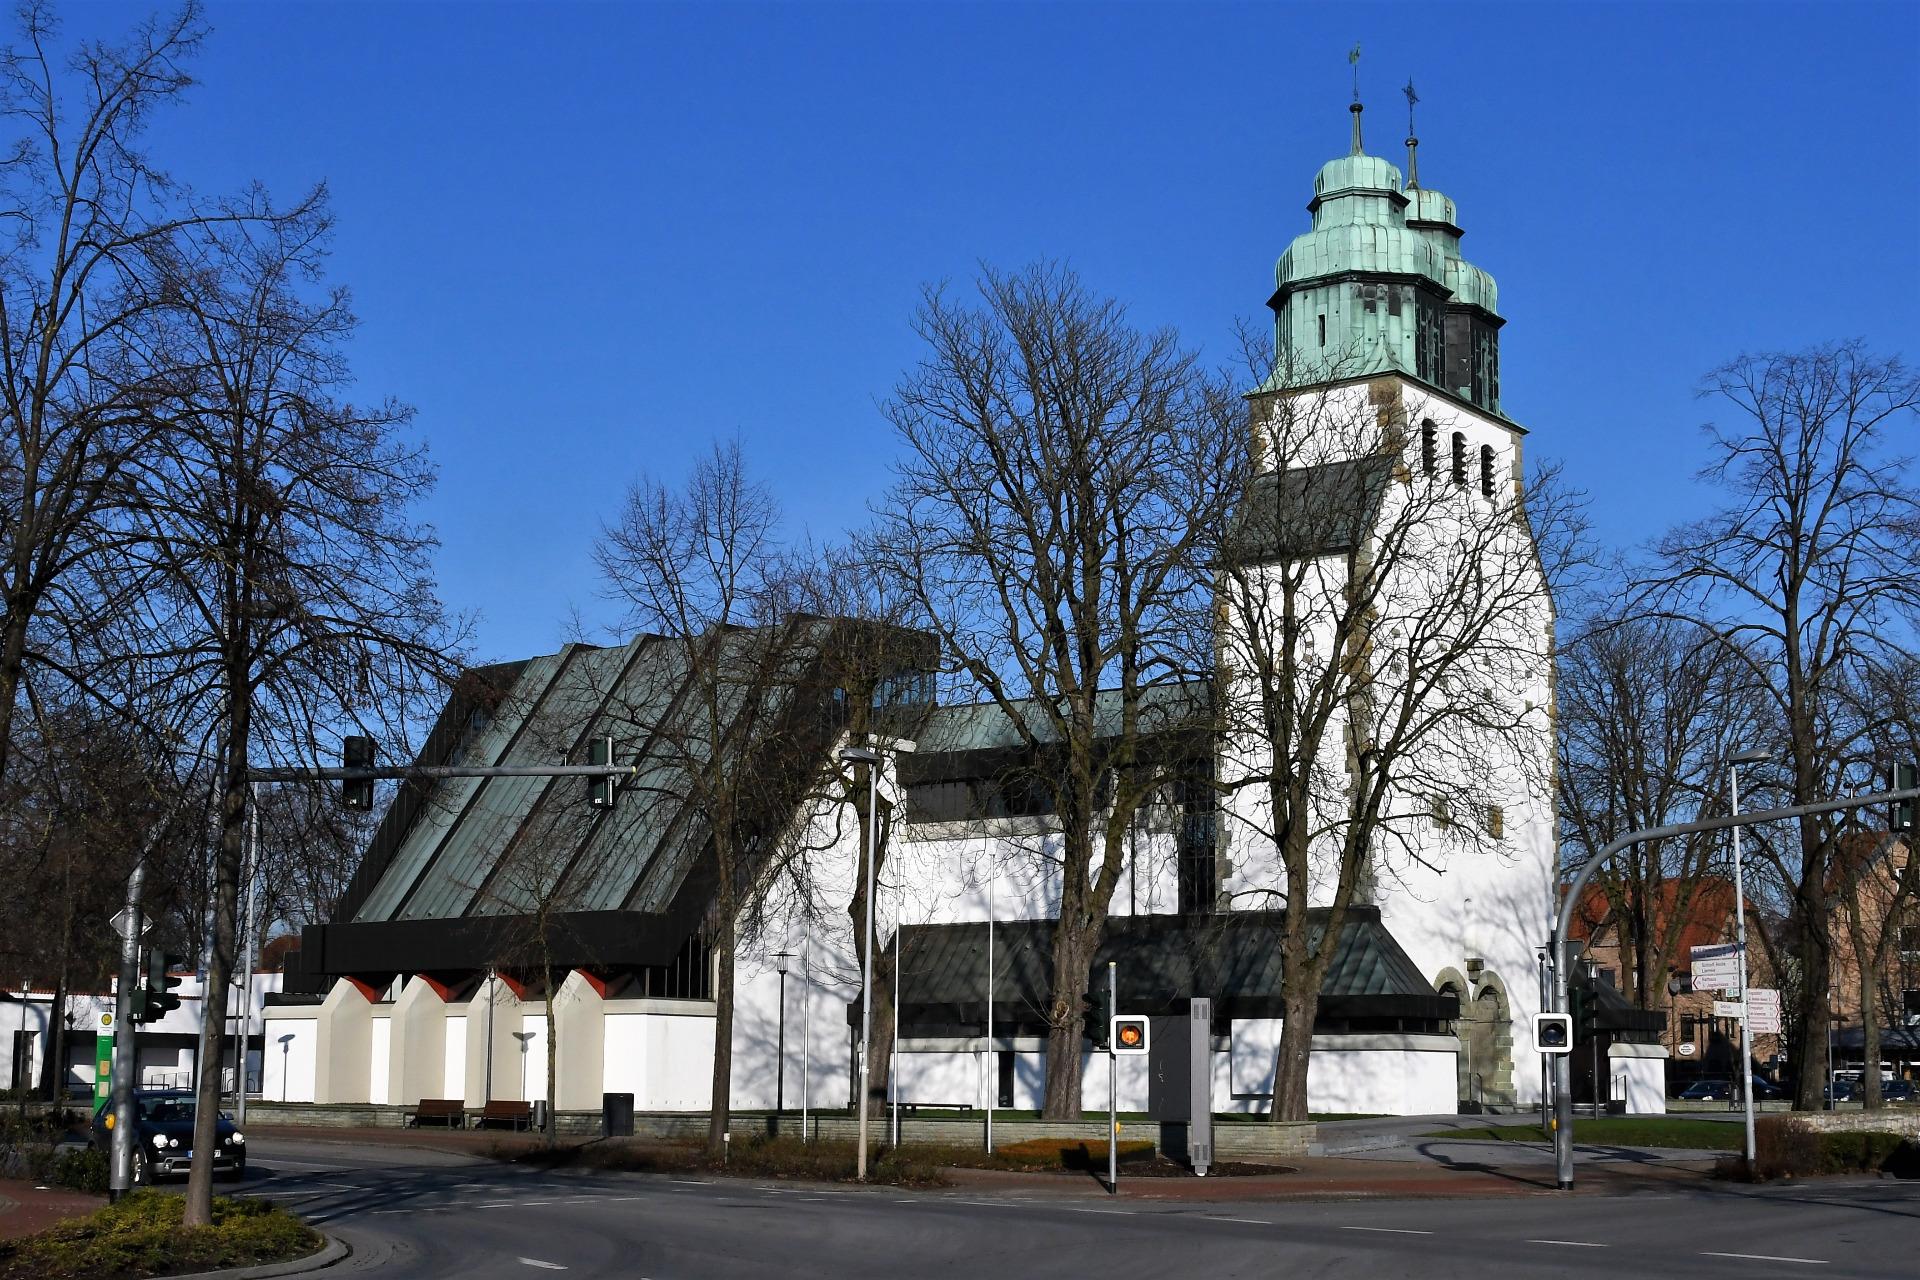 Pfarrkirche St. Johannes Nepomuk - Gemeinde Hövelhof